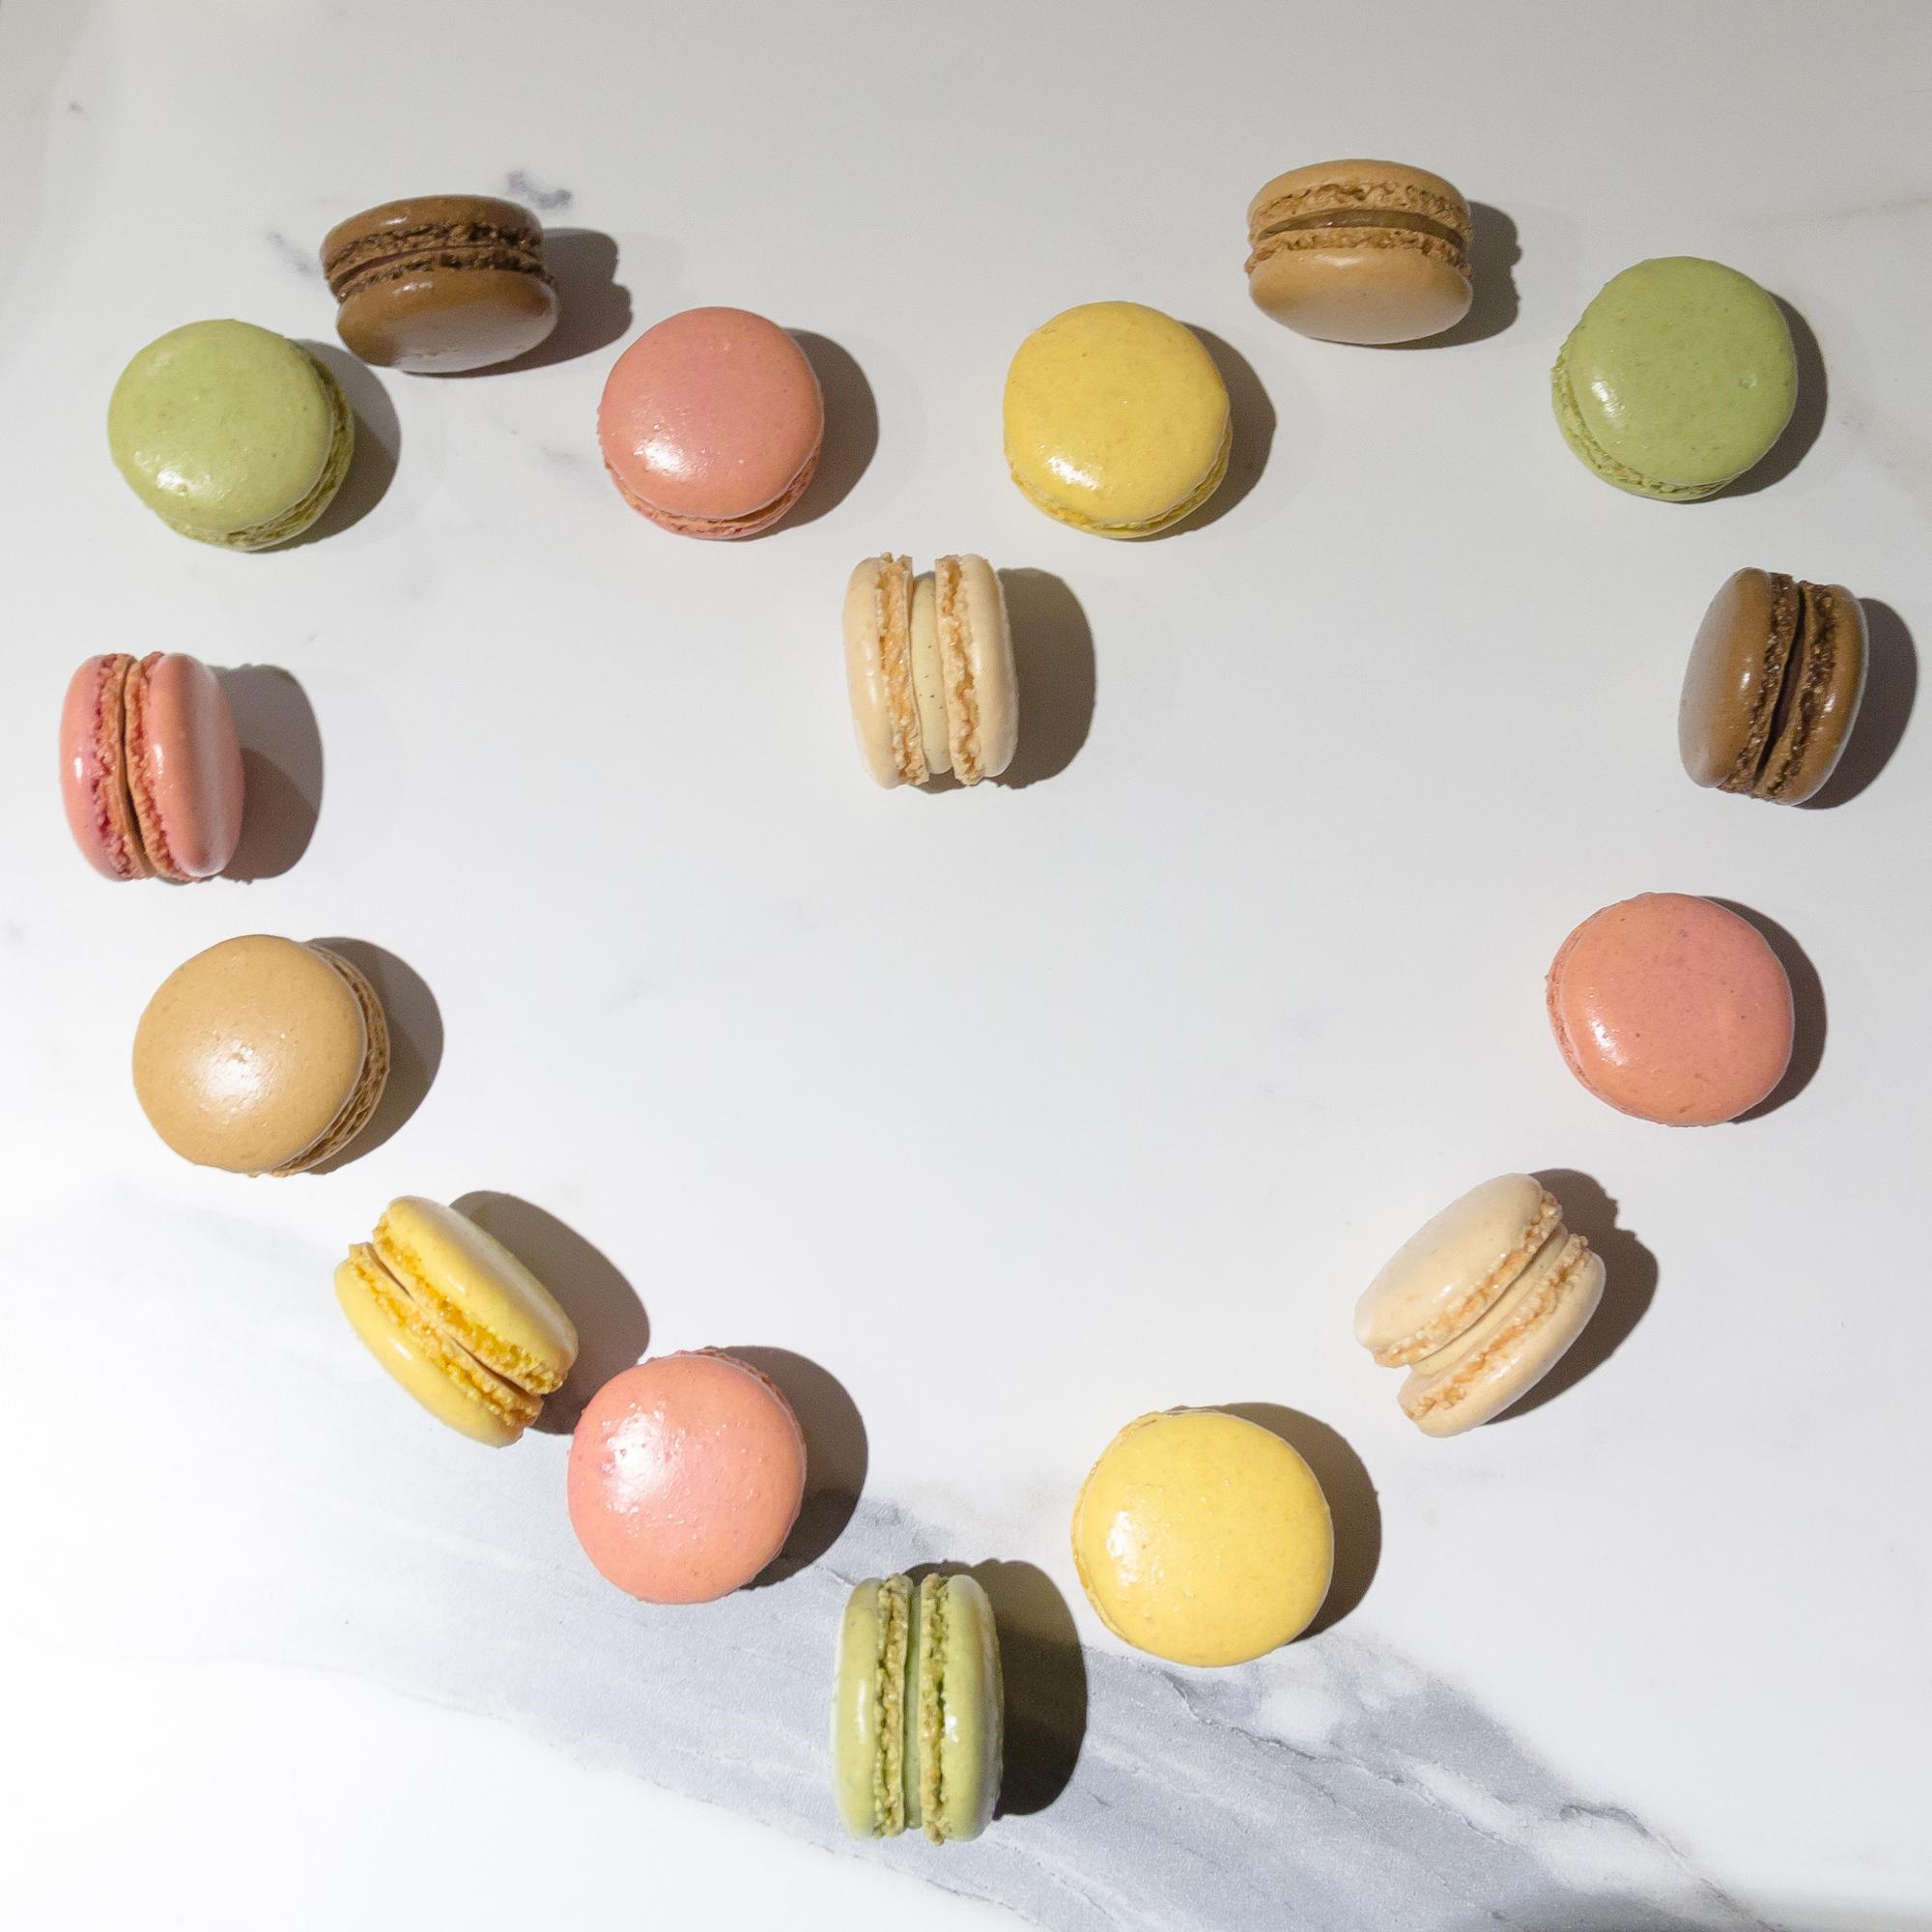 Macaron Manicure